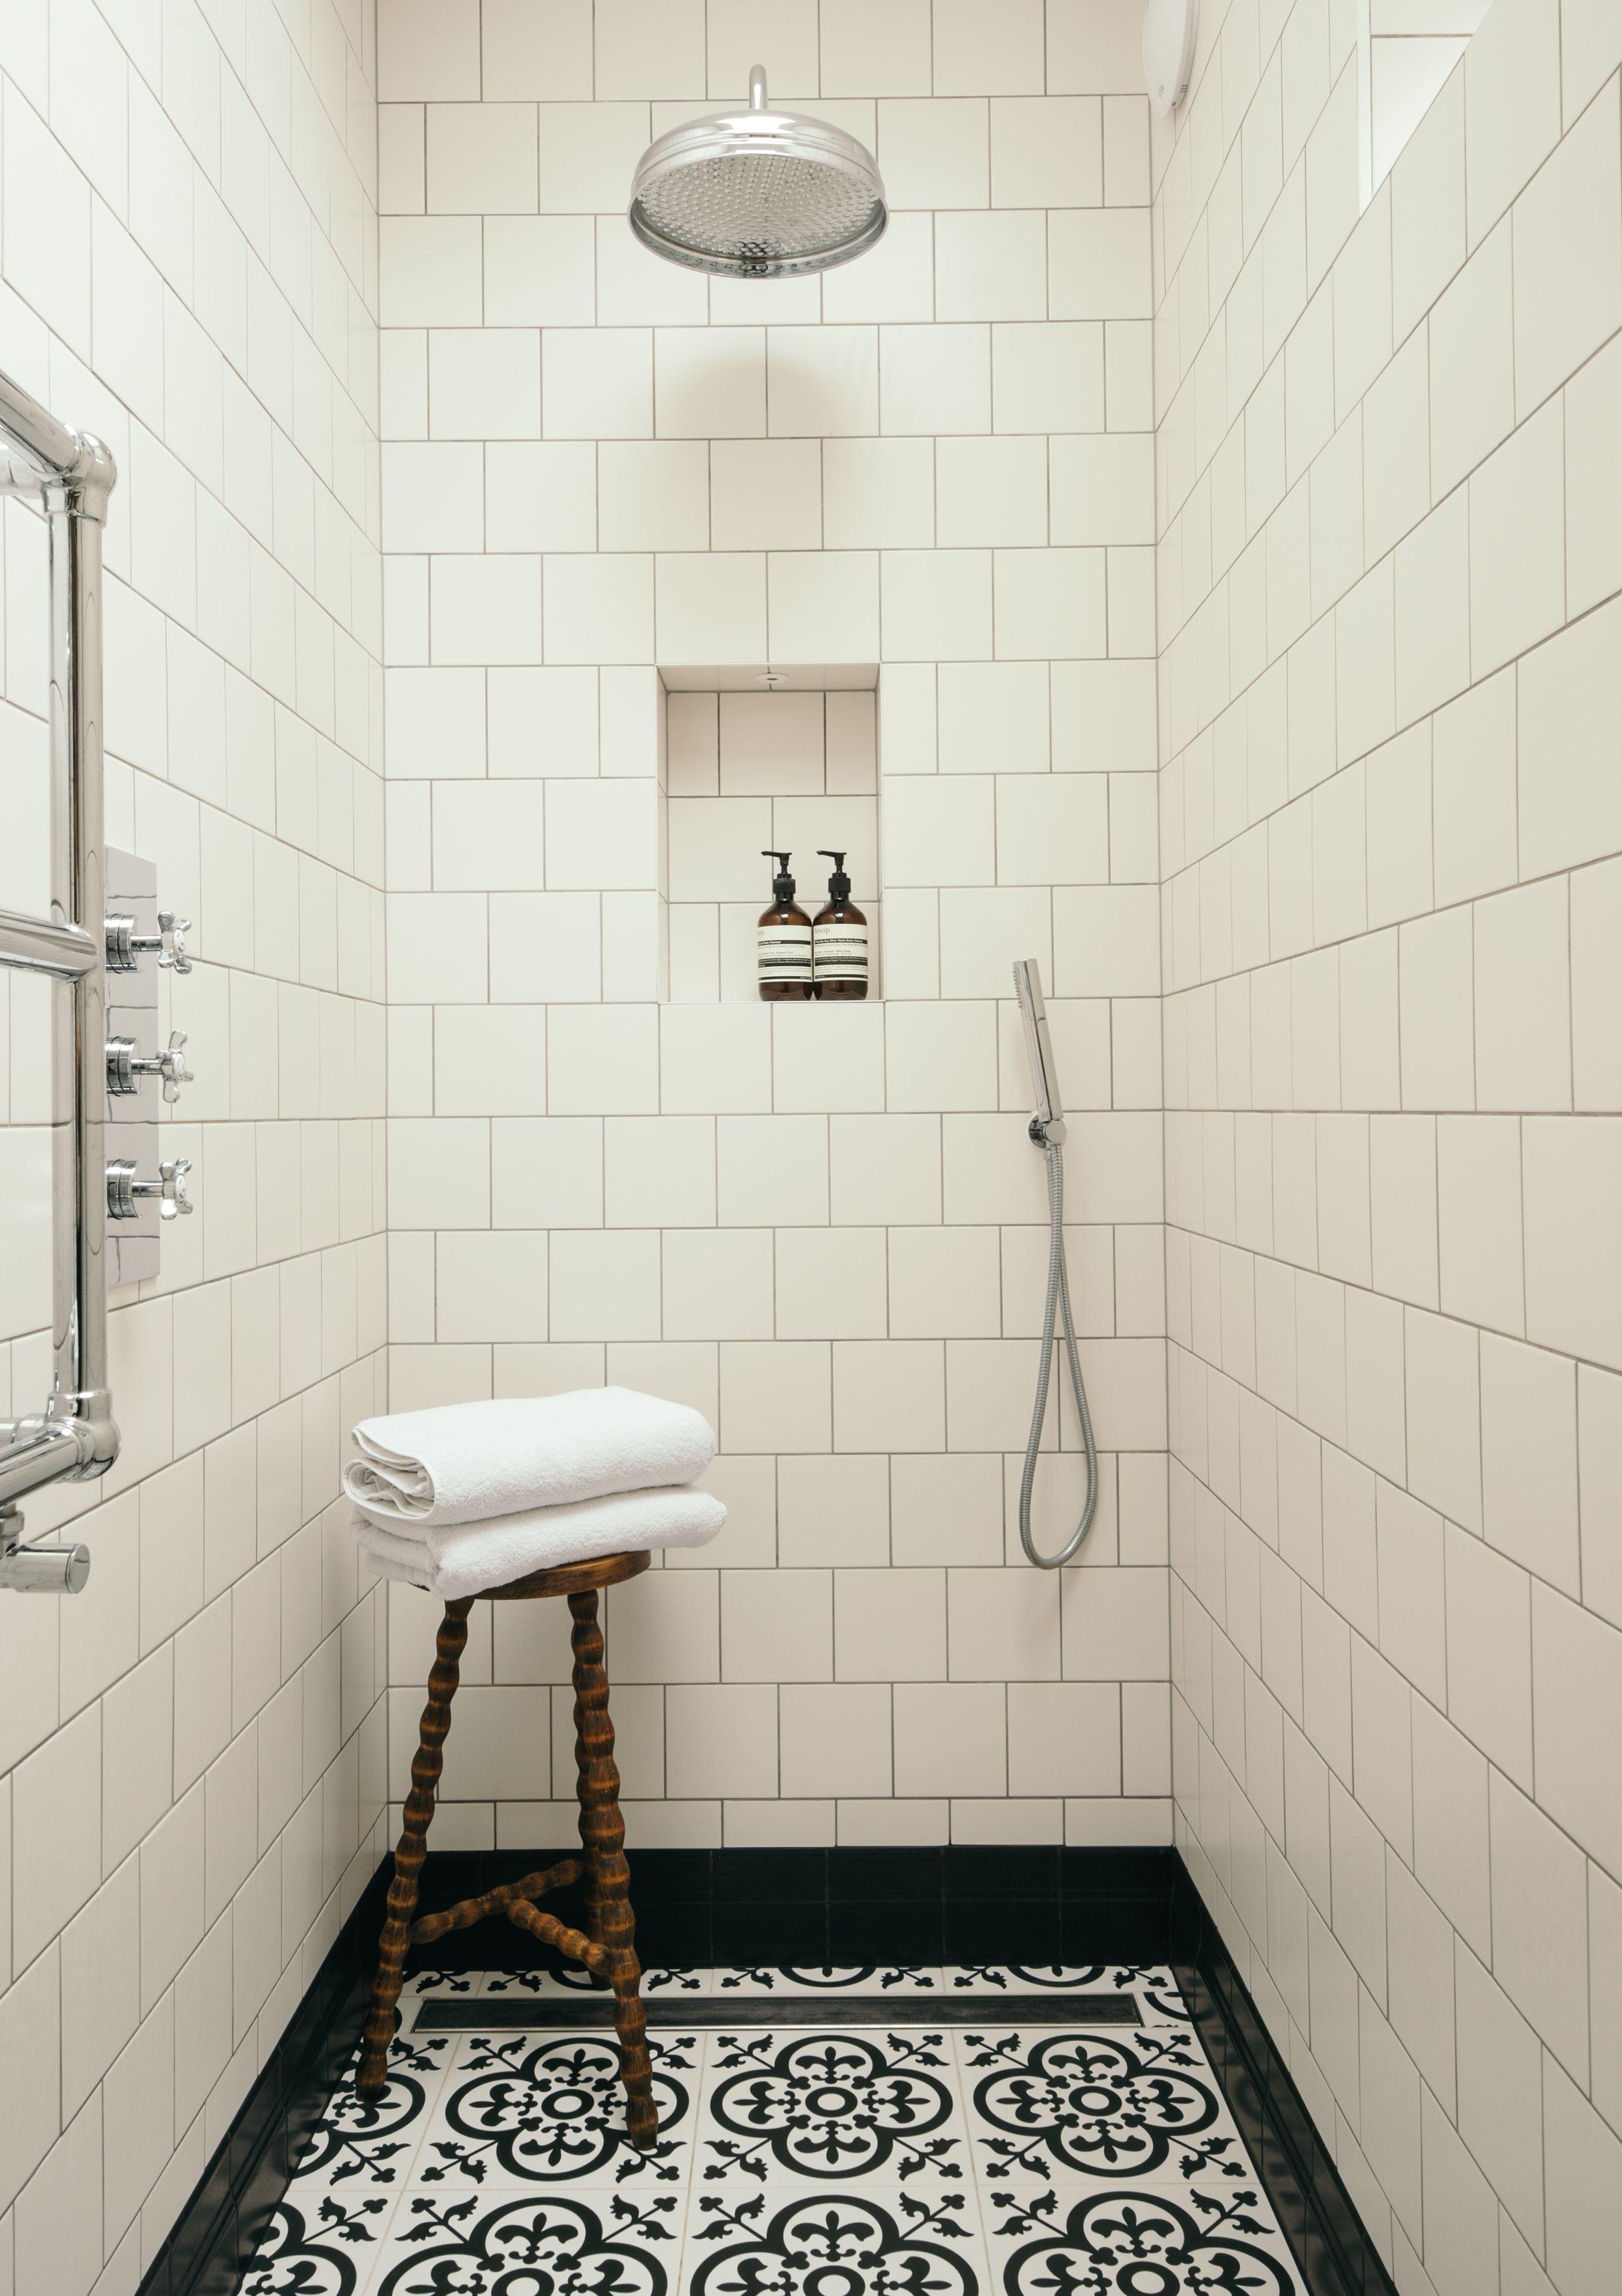 Simple Monochrome Walk In Shower Design Fired Earth Tiles Bobble Stool Talia Cobbold Interior Design Shower Tile Tile Bathroom Interior